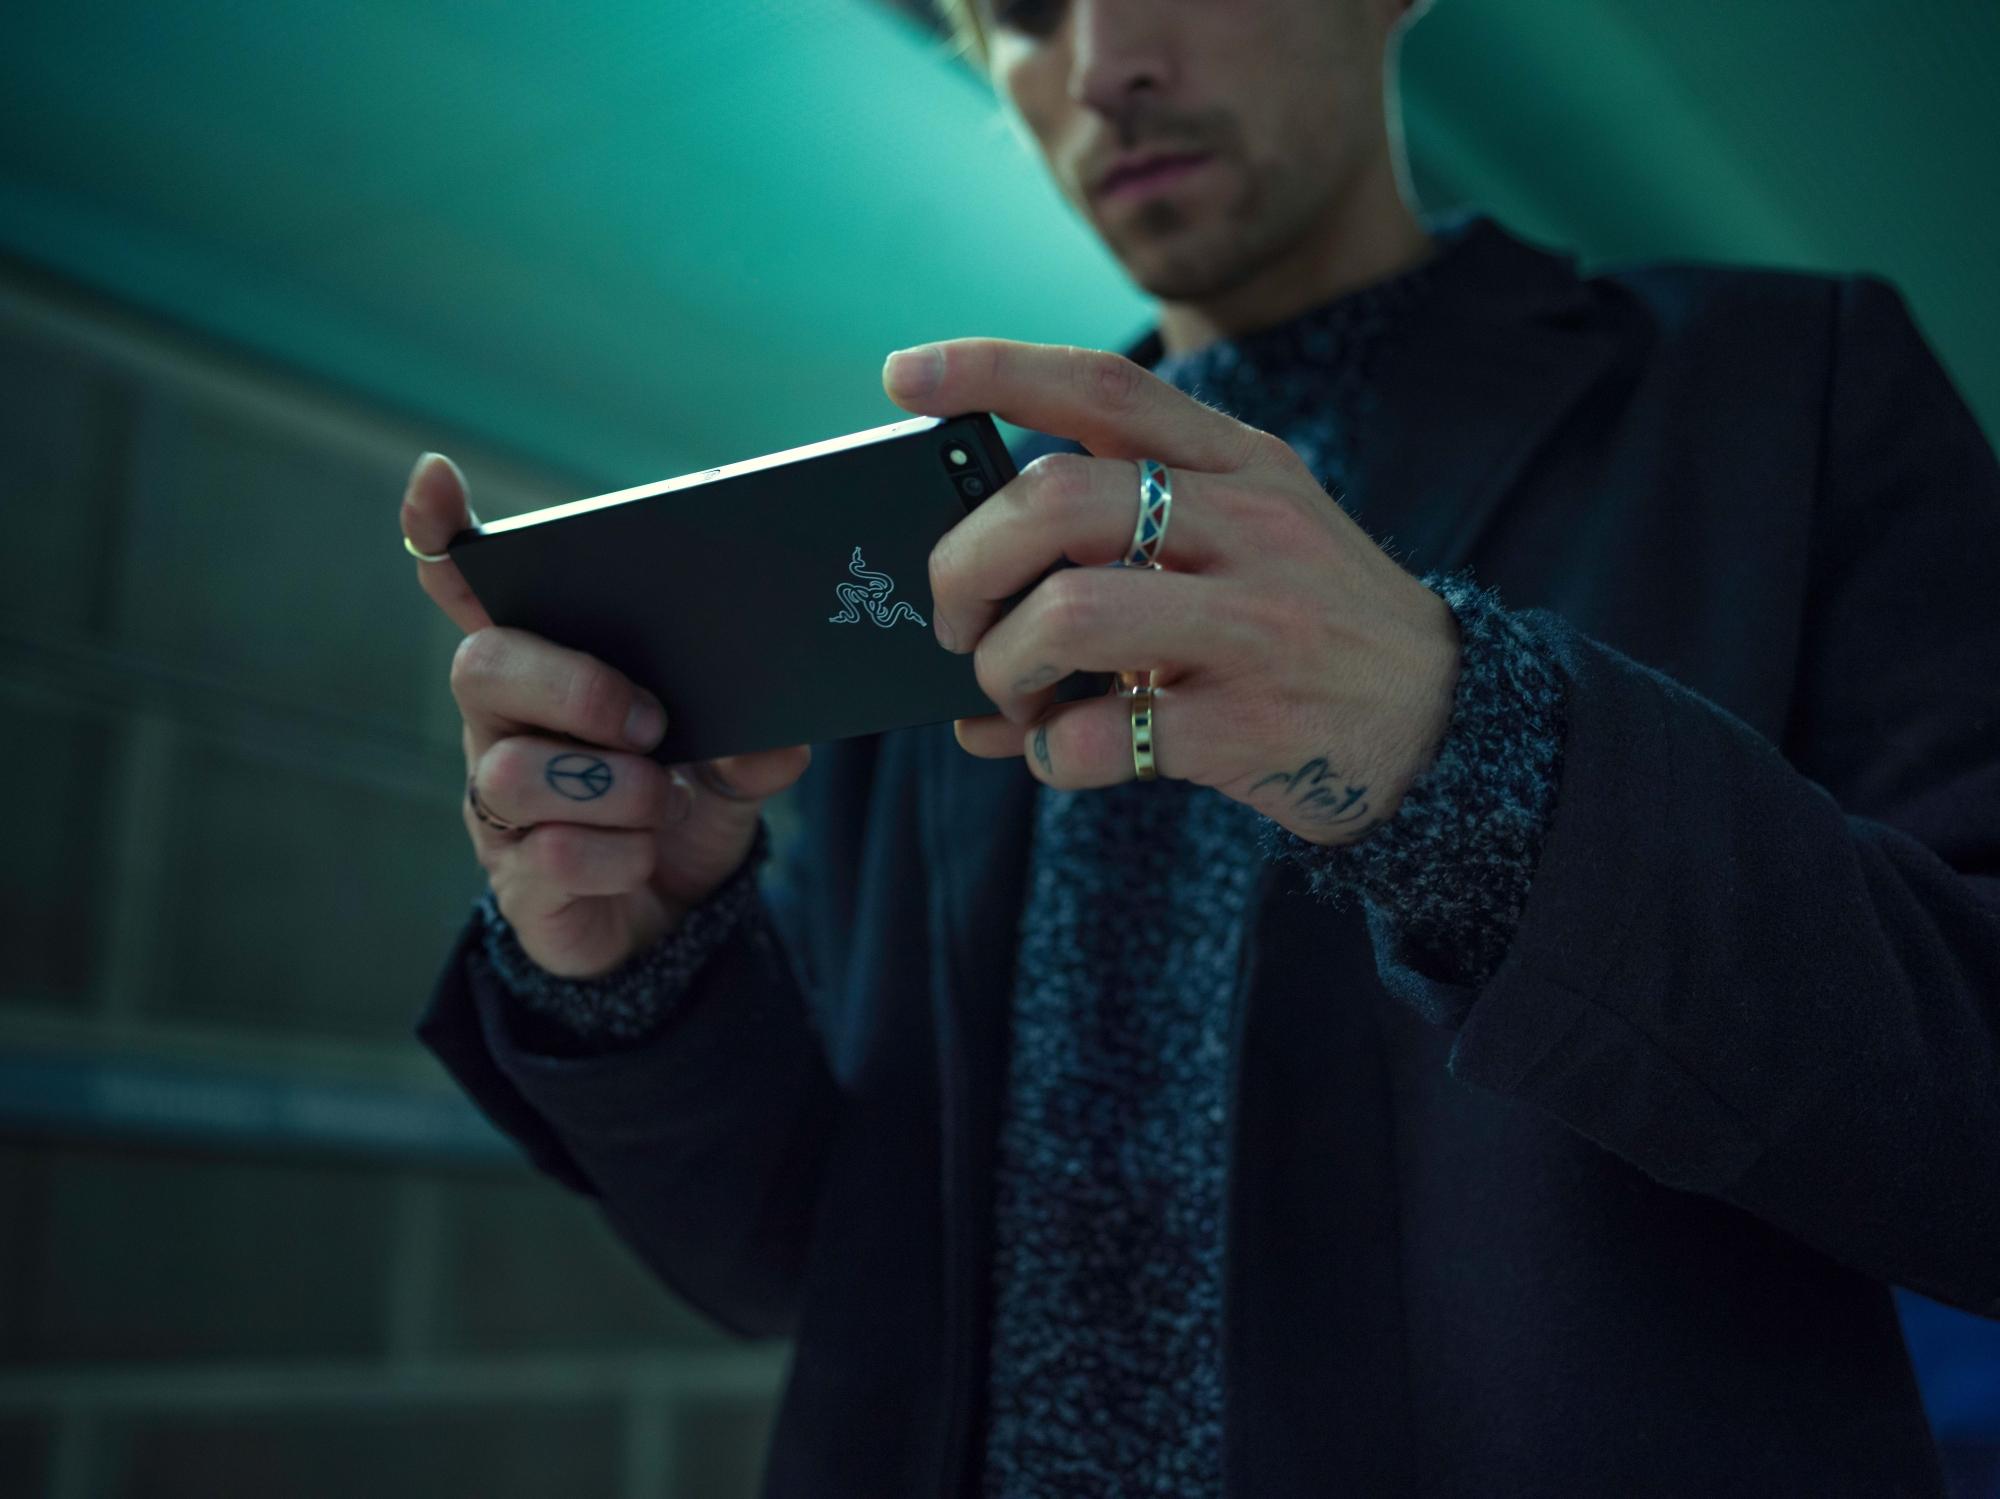 Razer-Phone-Lifestyle-05